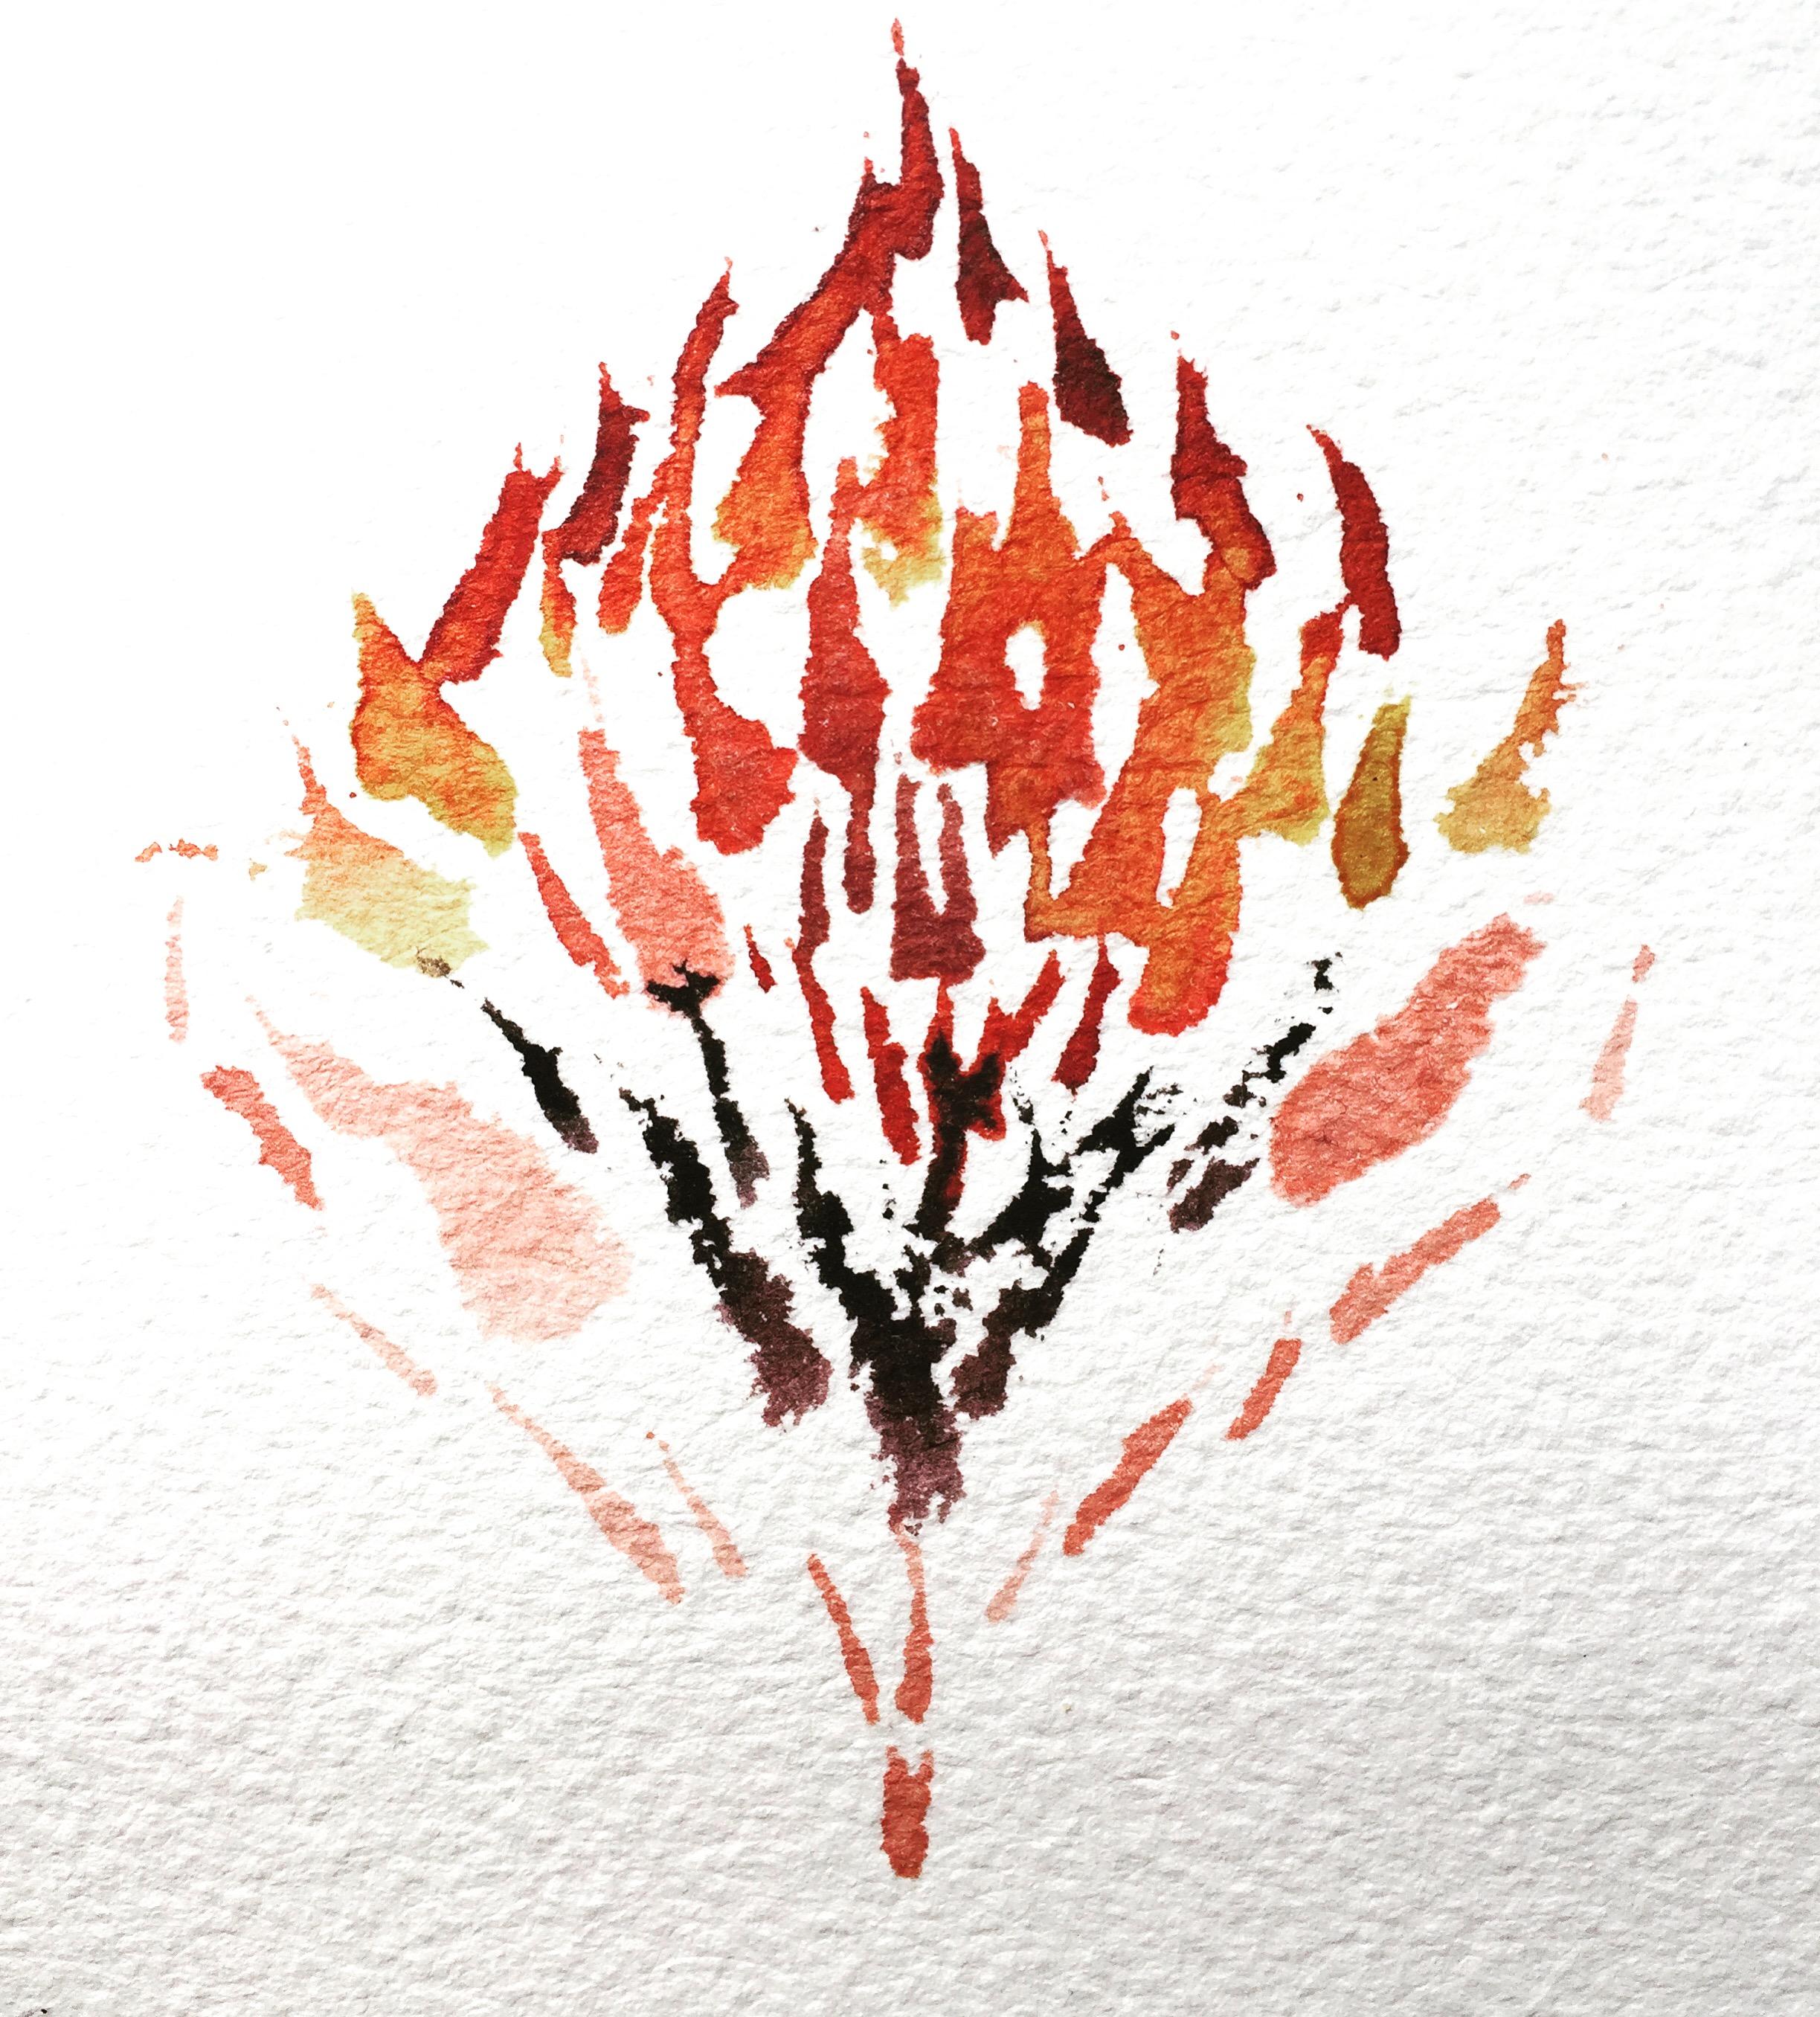 Fireflower, 2016